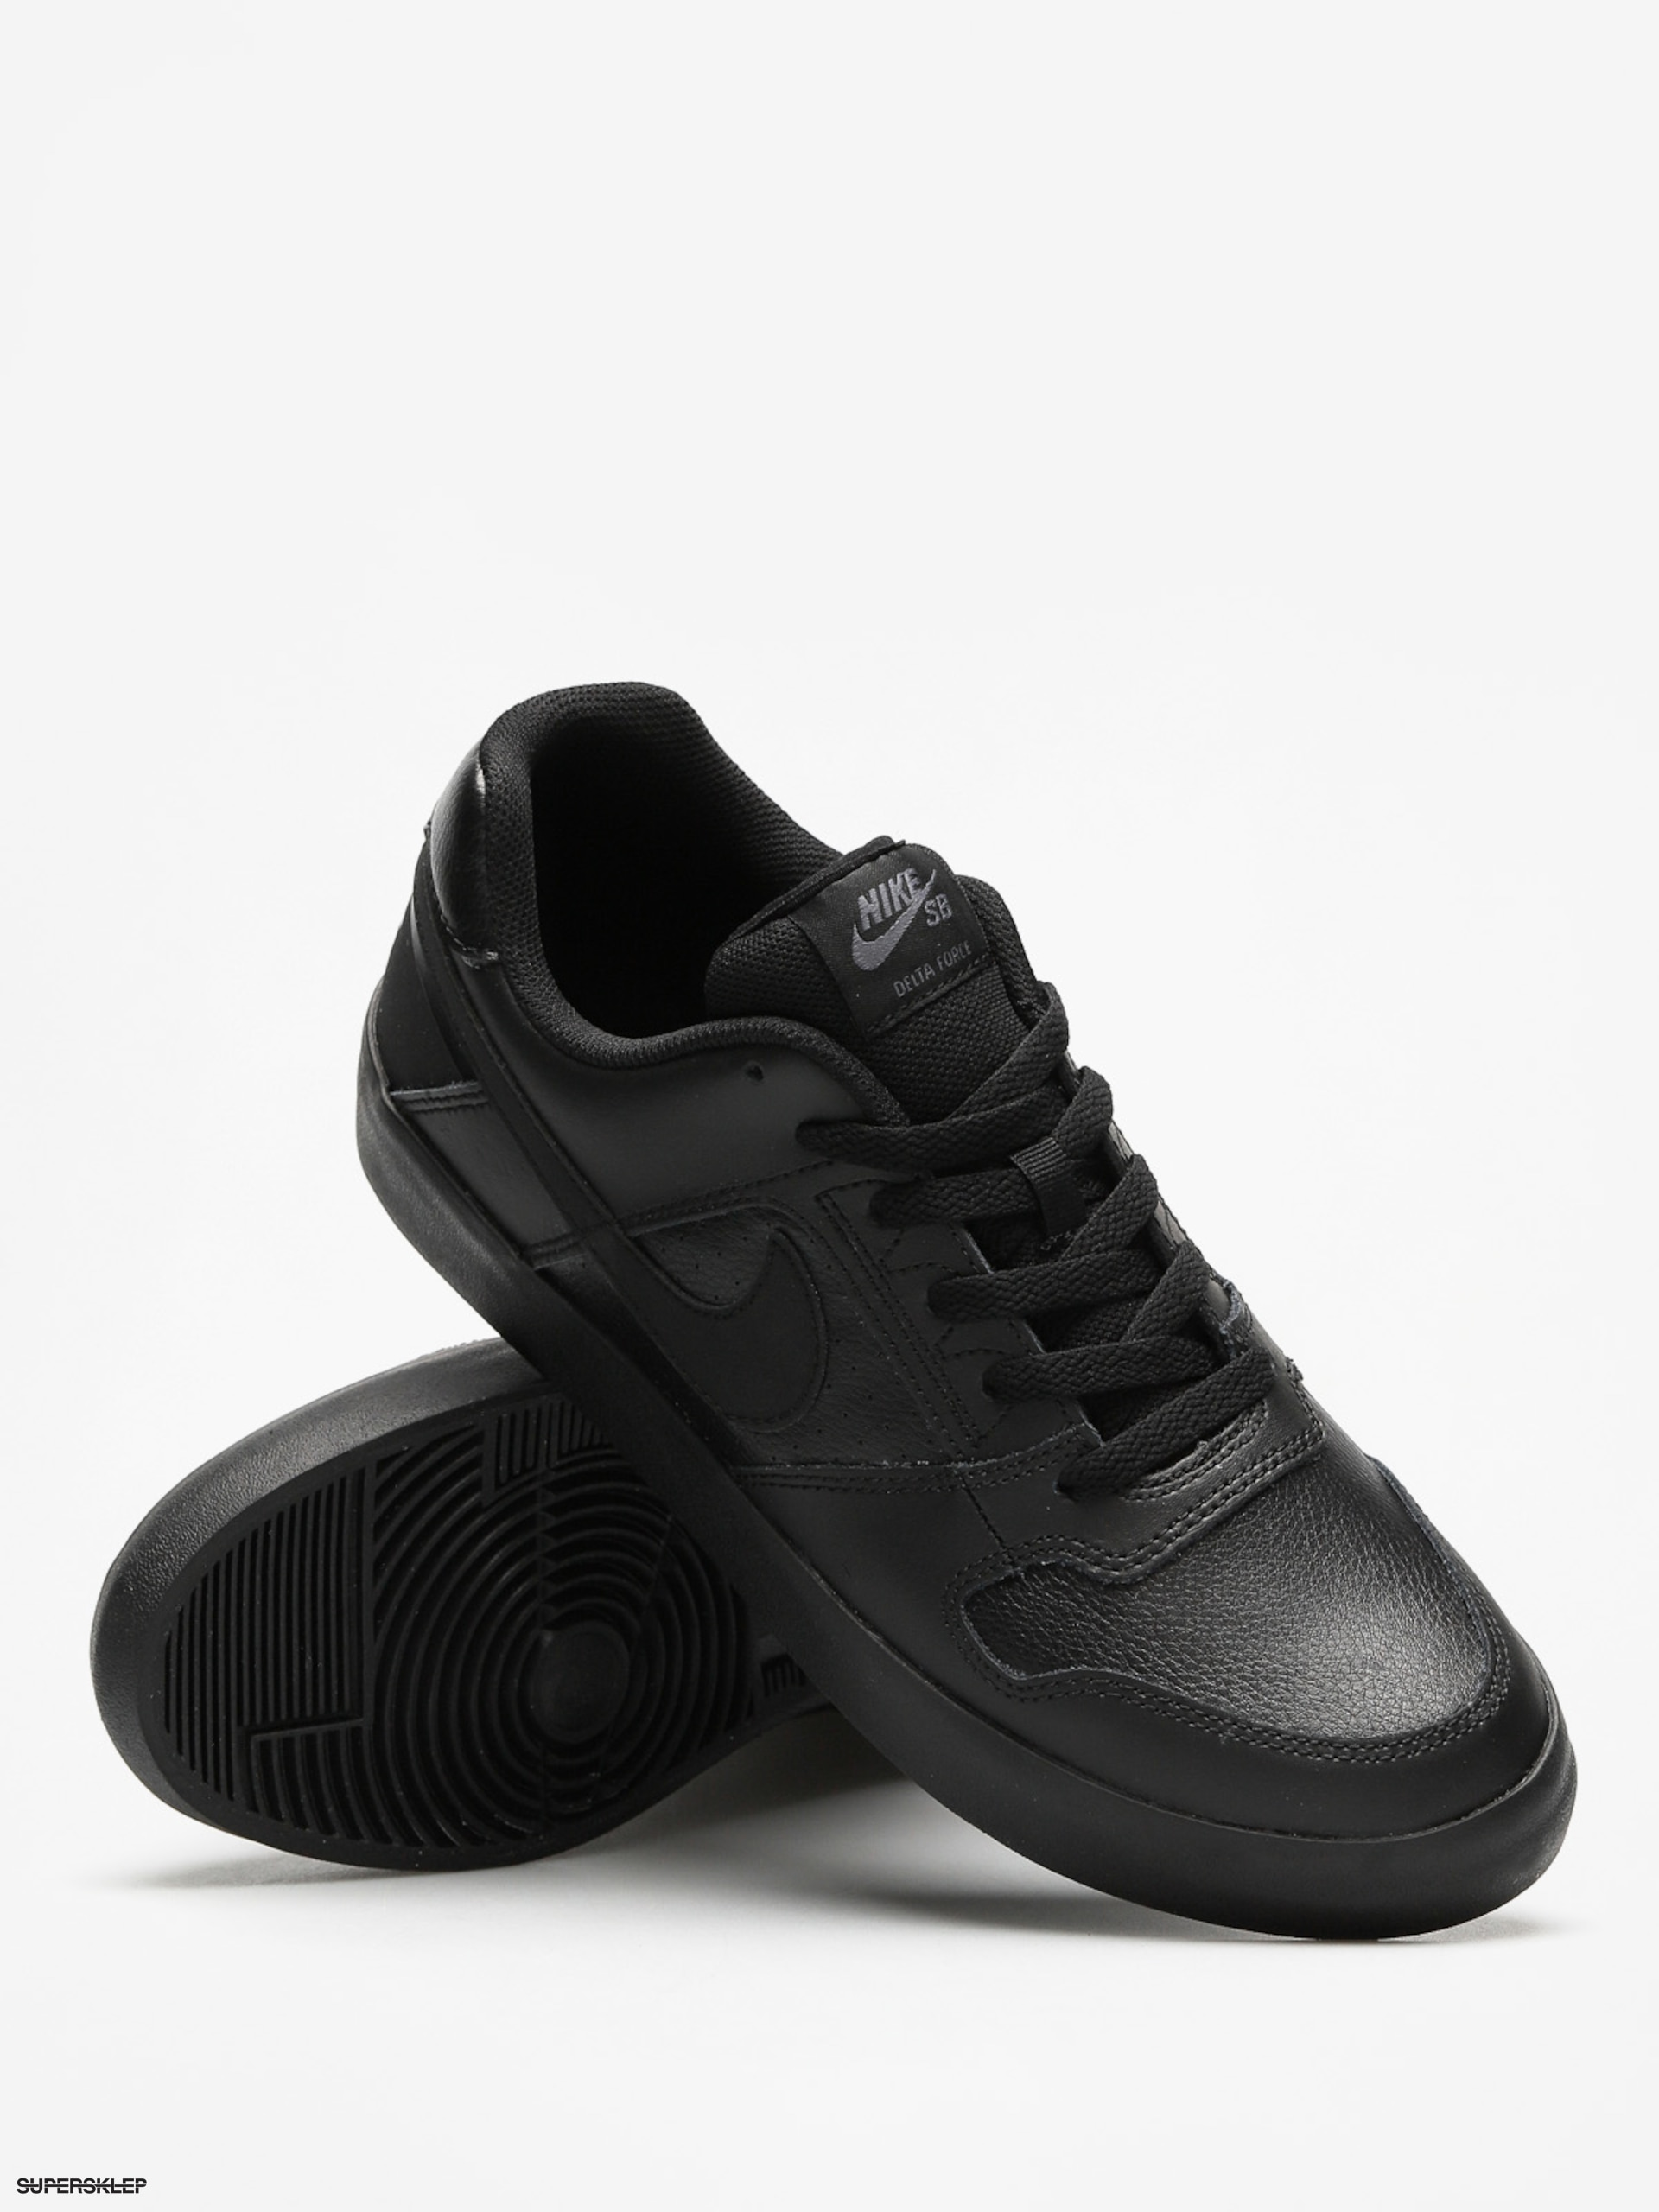 310a082b0d1 Boty Nike SB Sb Delta Force Vulc (black black anthracite)